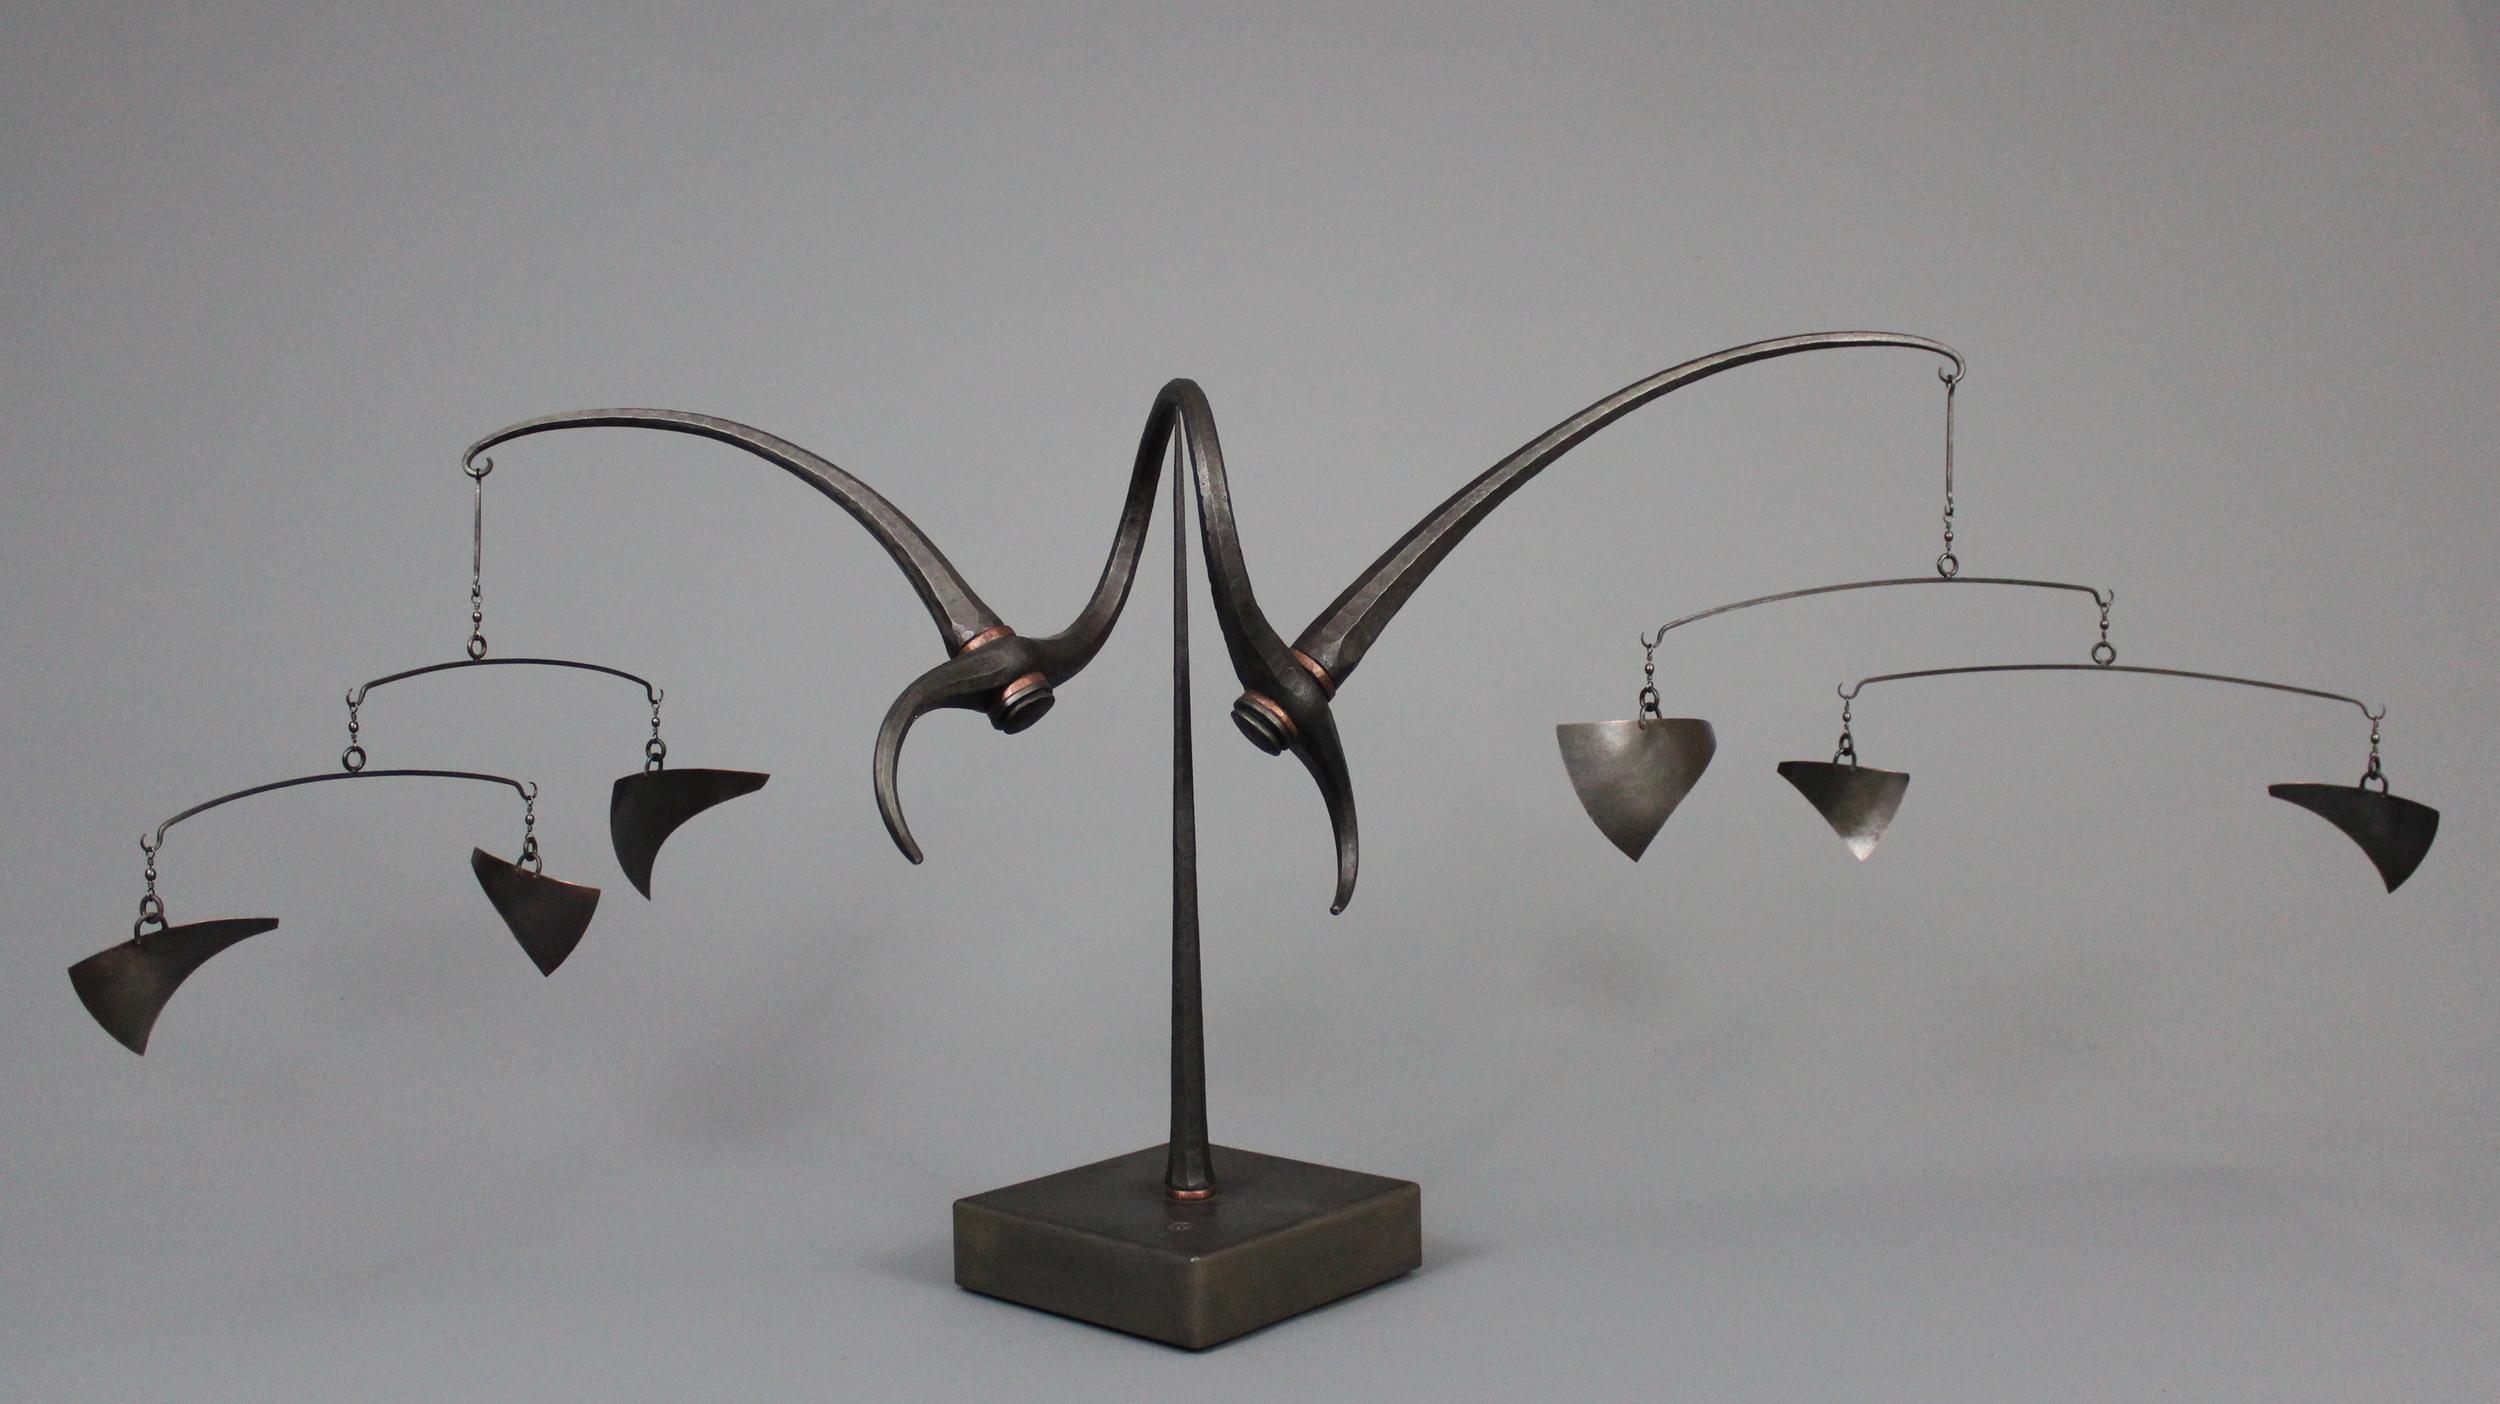 untitled - mild steel, copper, 2012